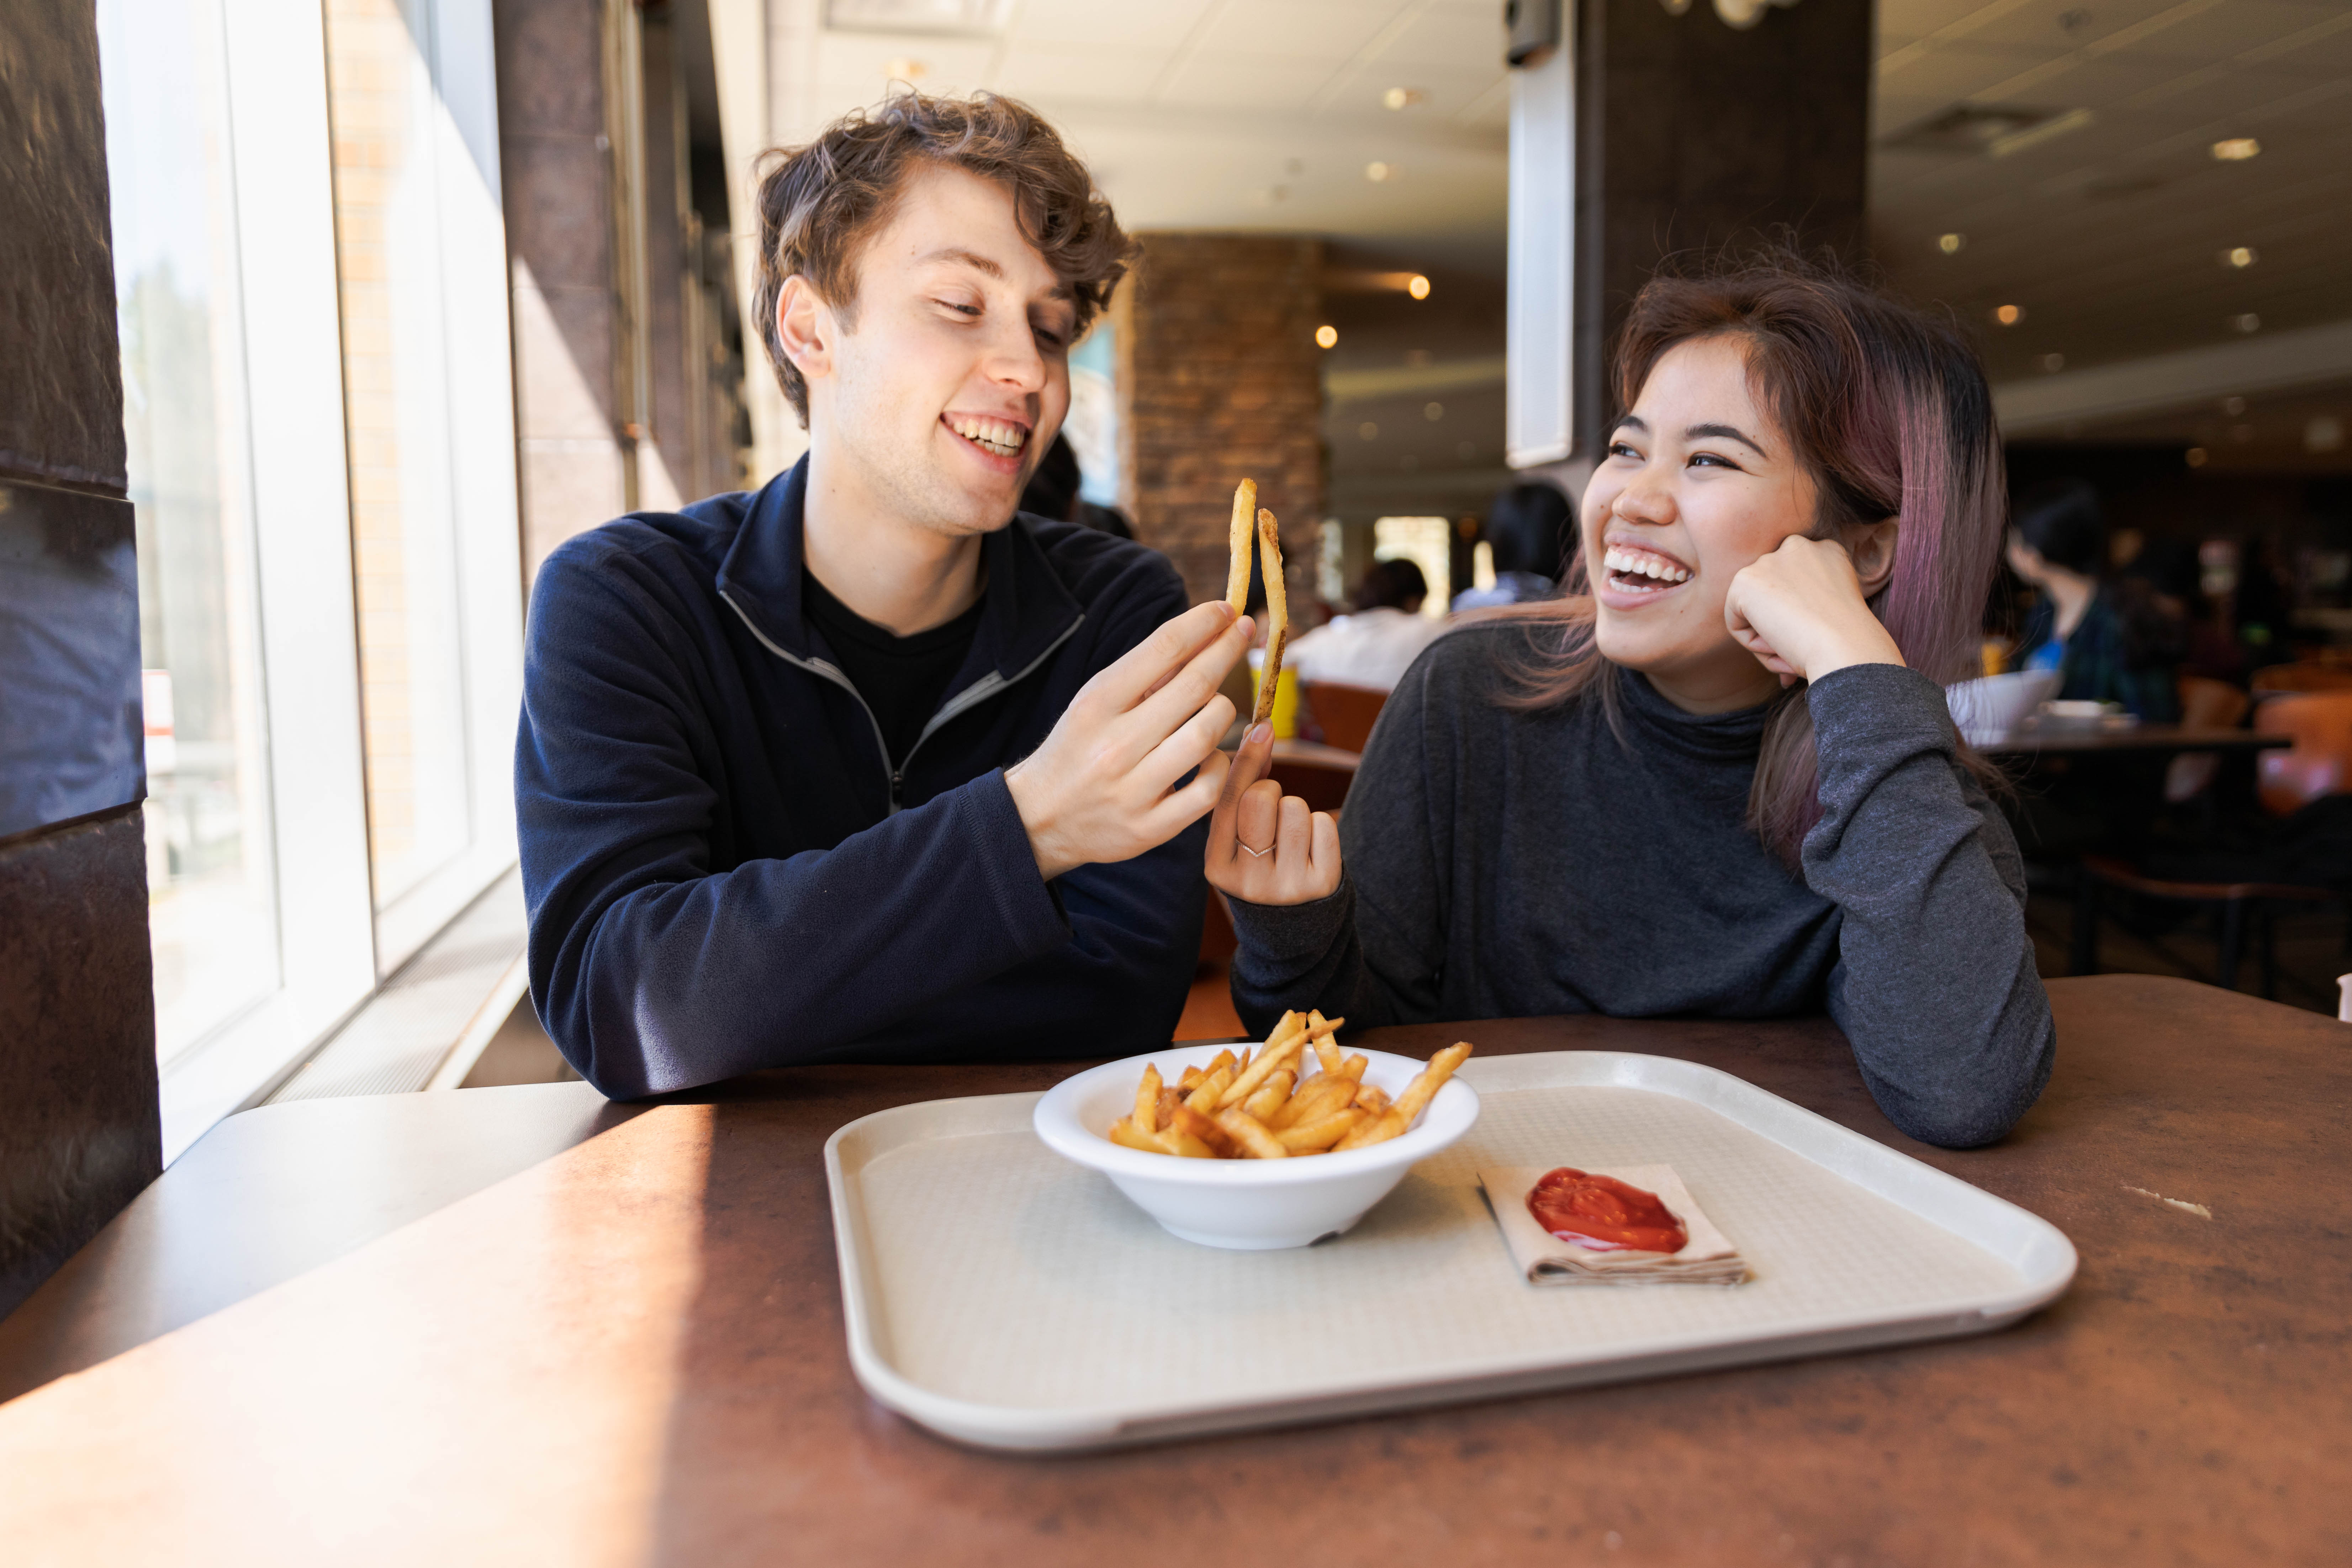 Jordan and Sara cheers-ing their fries